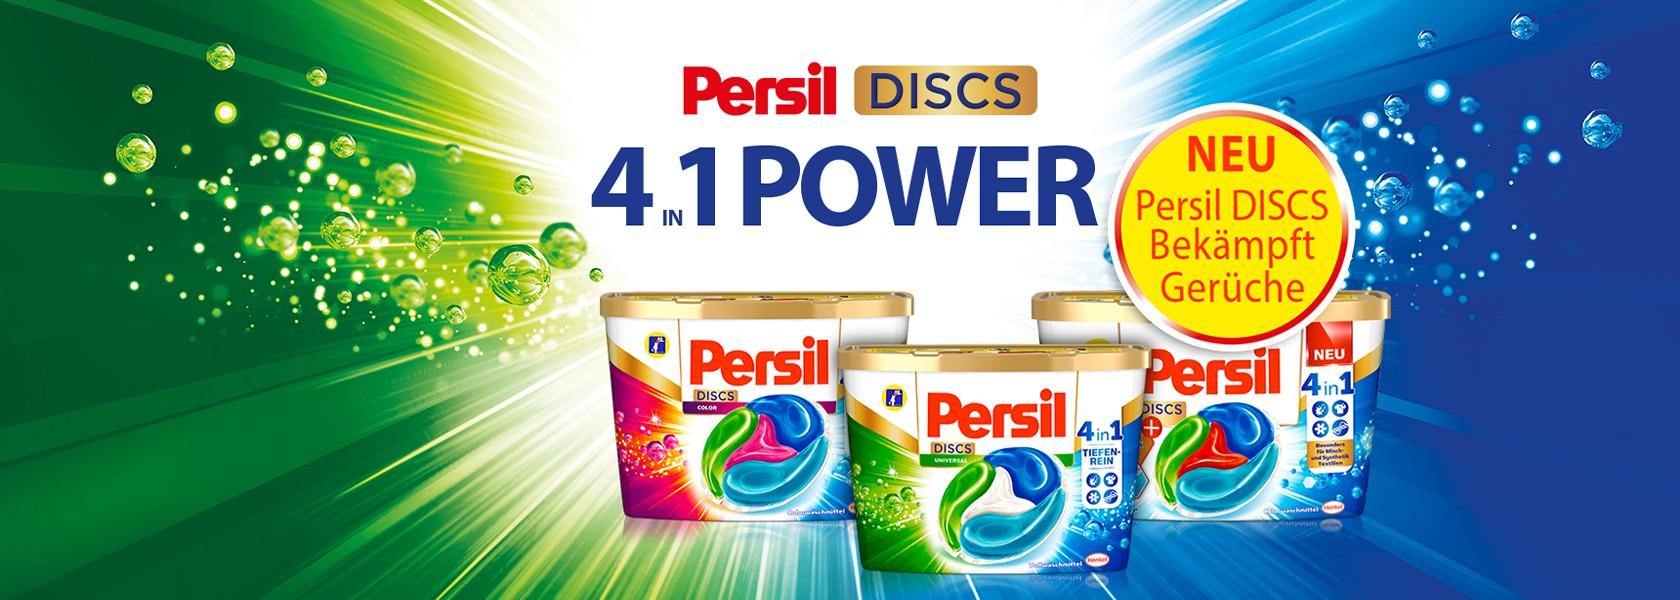 Persil Discs 4in1 Power